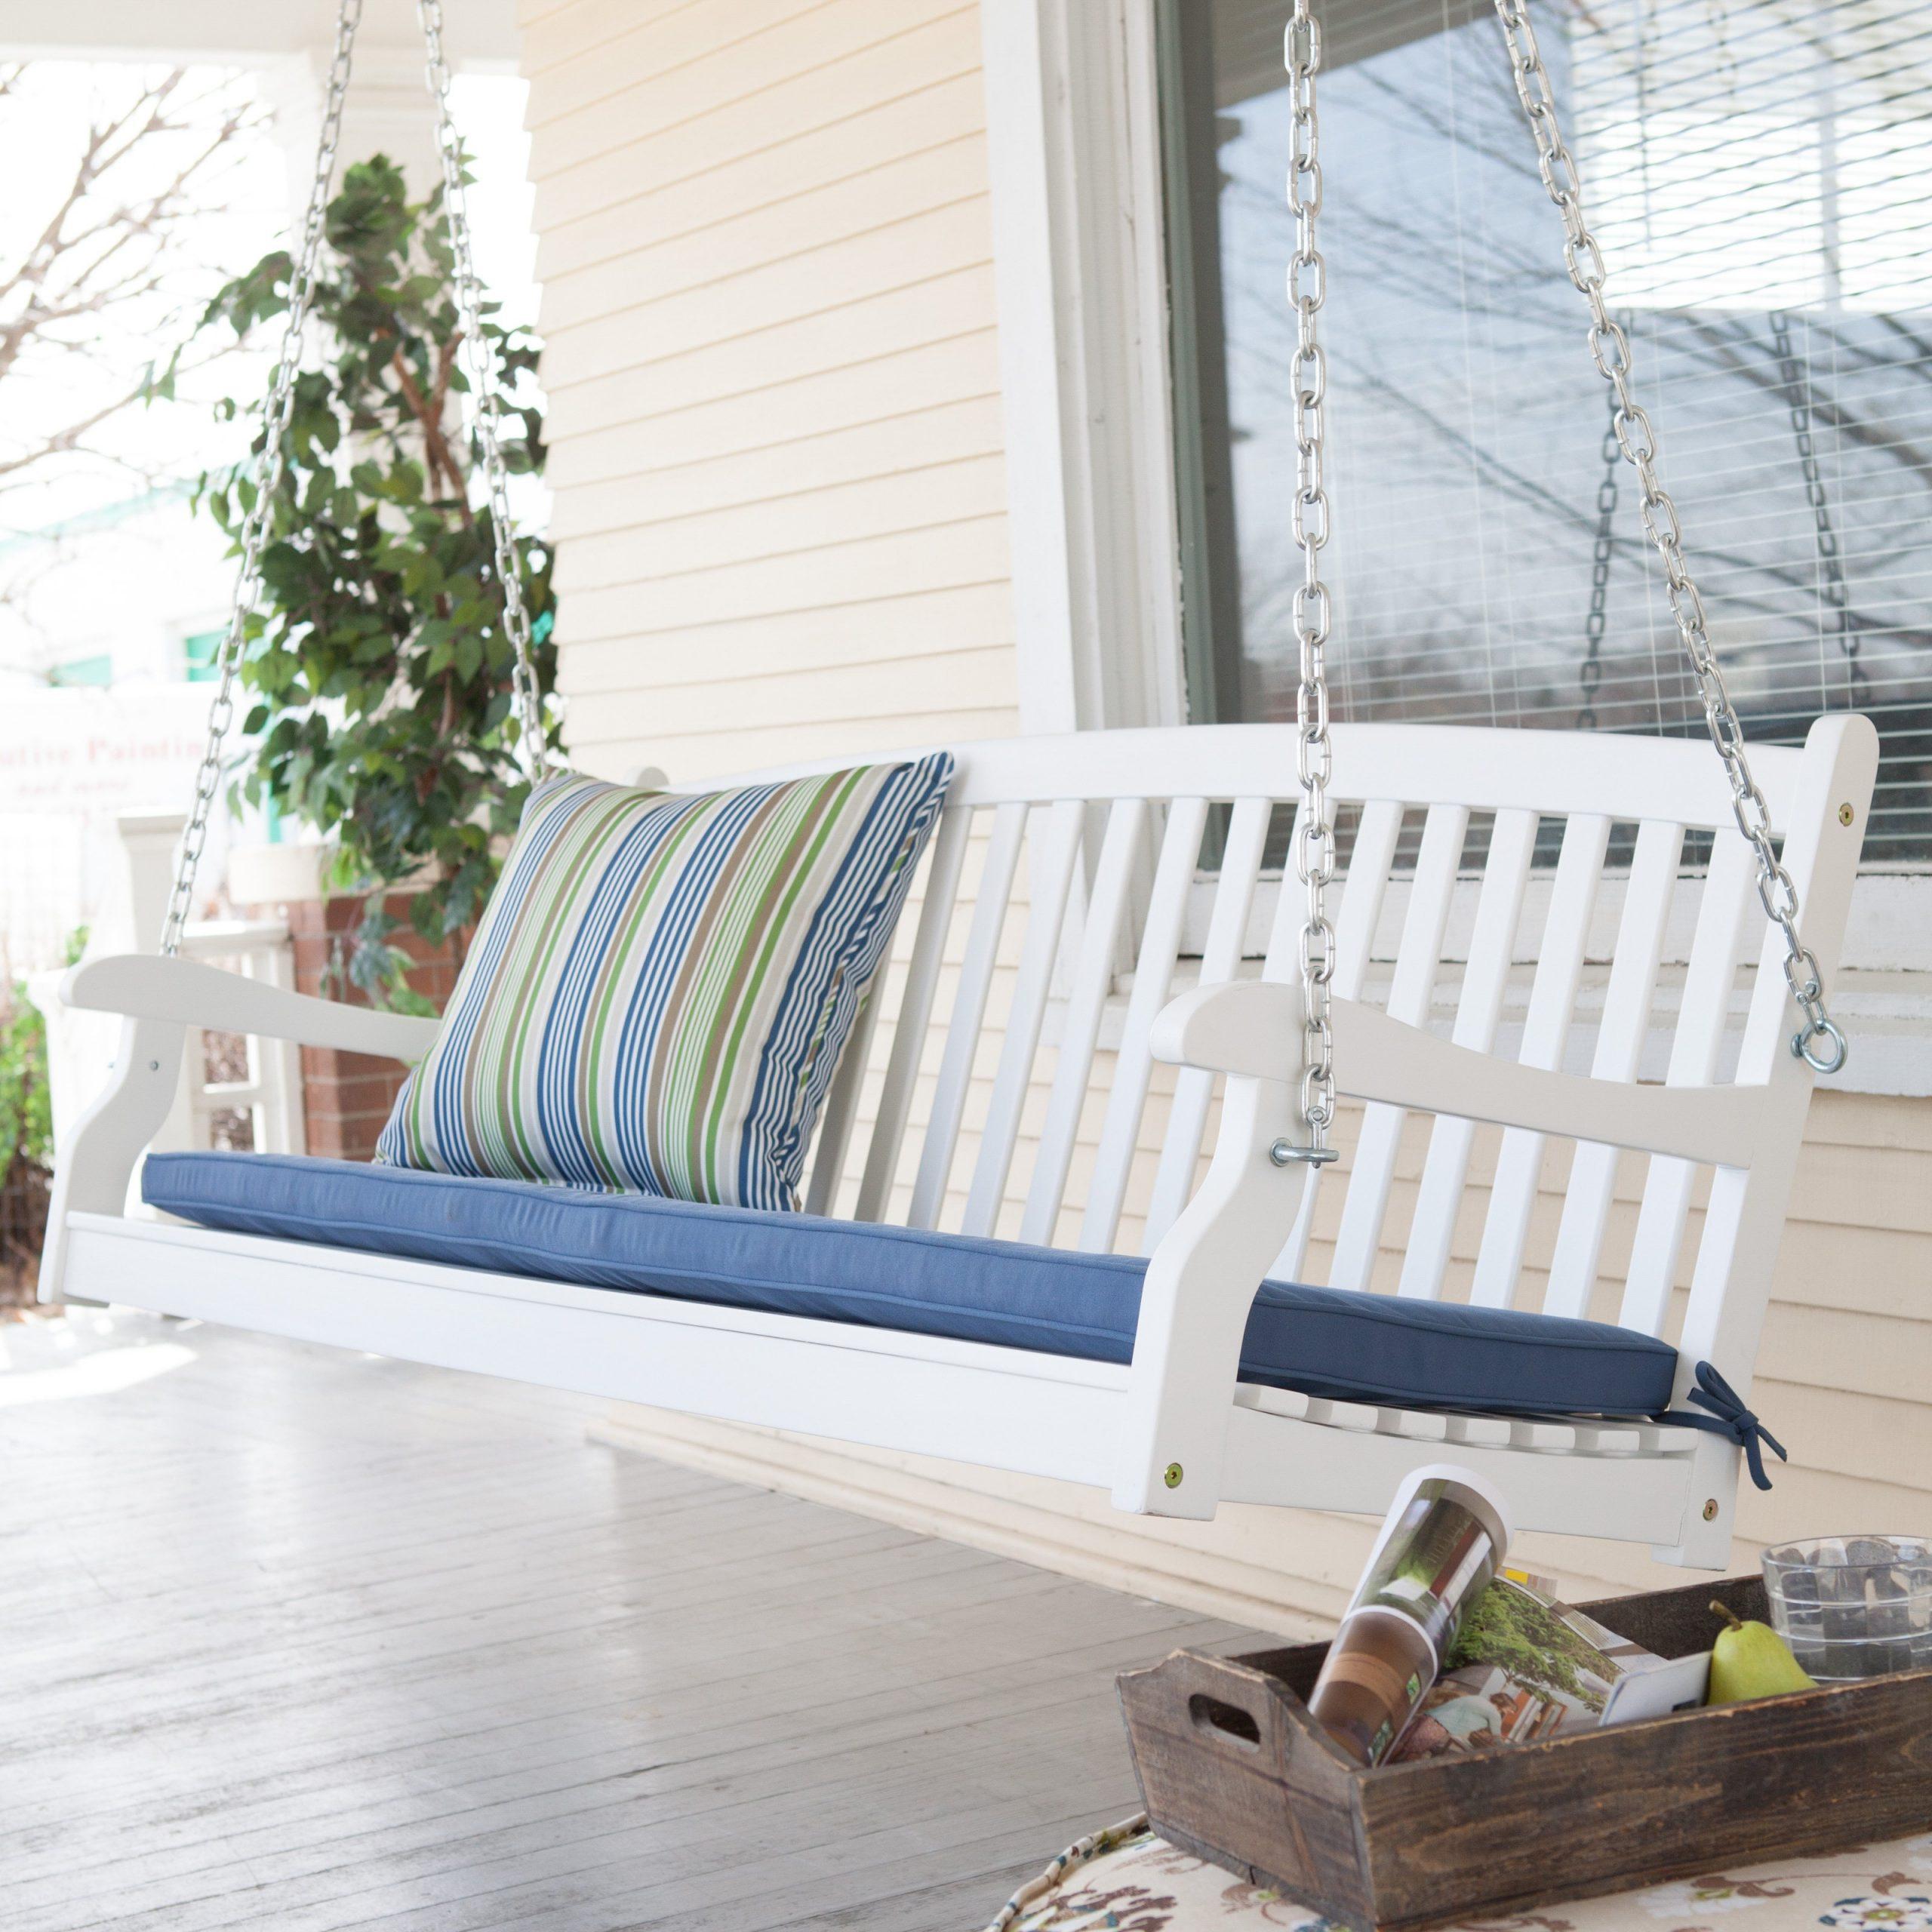 Vinyl Hanging Porch Swing Regarding Nautical Porch Swings (View 9 of 25)